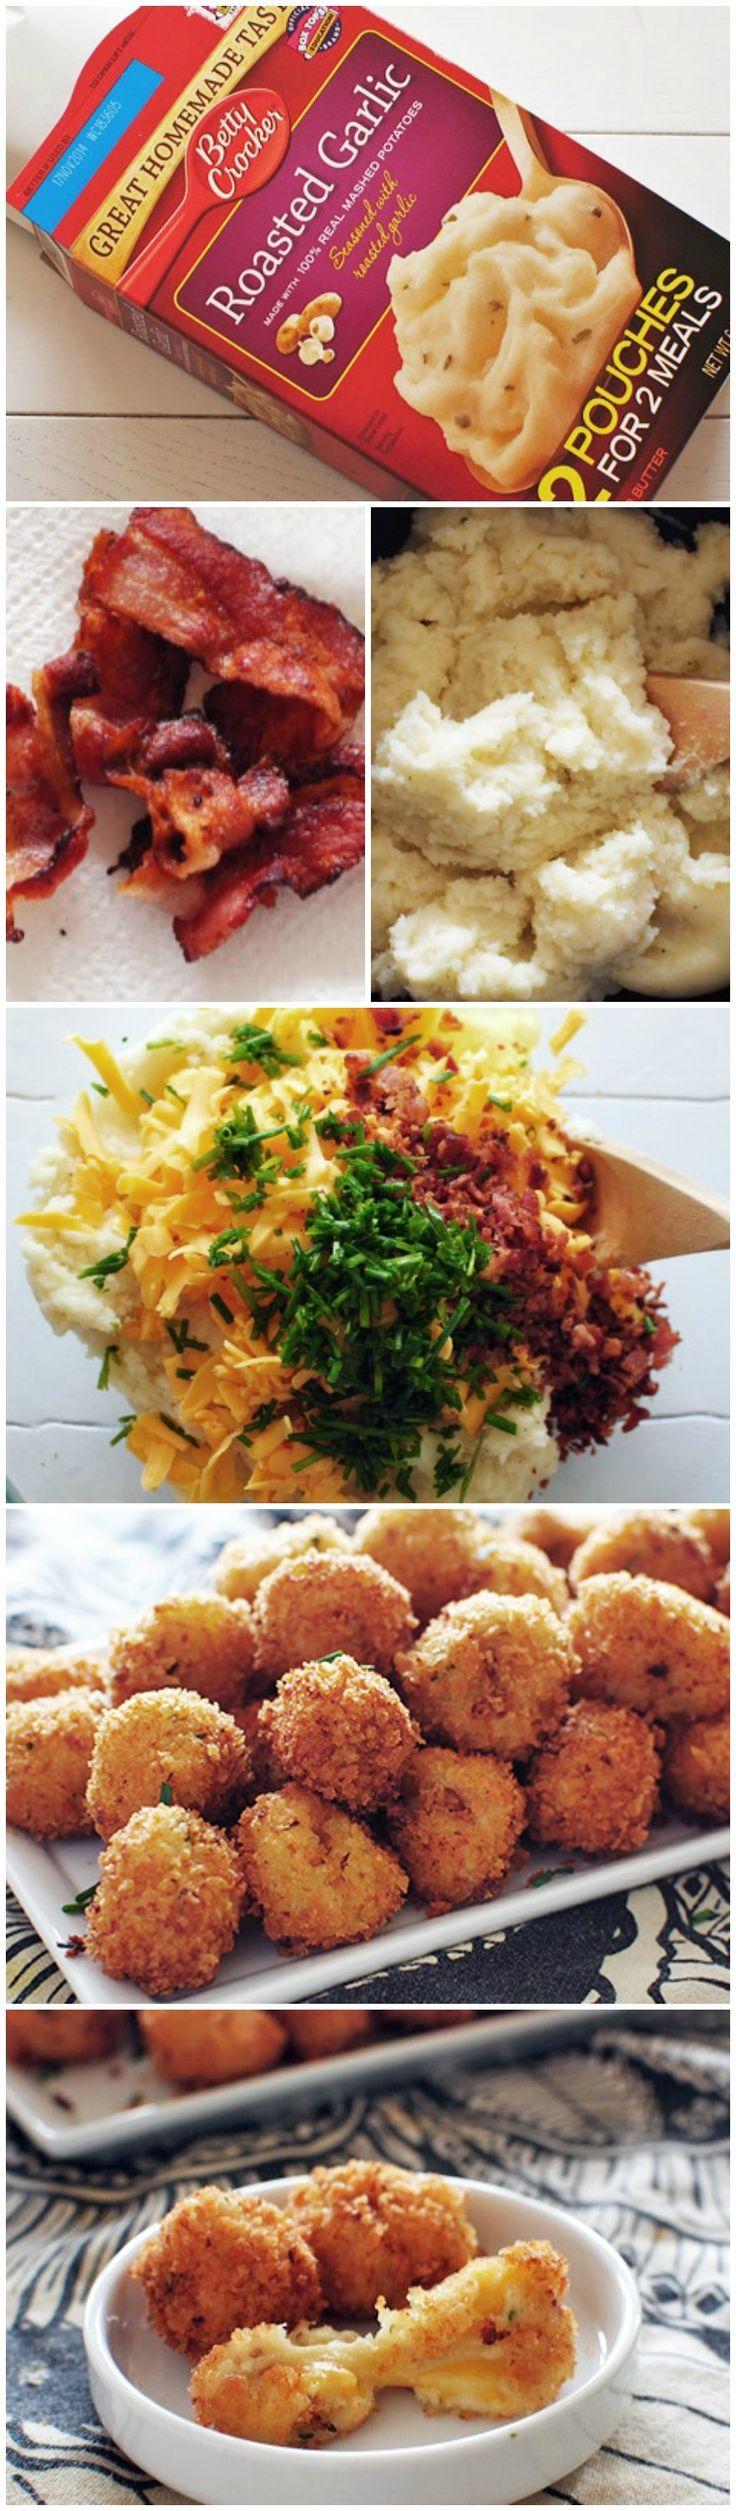 Loaded Cheesy Mashed Potato Balls #bettycrocker